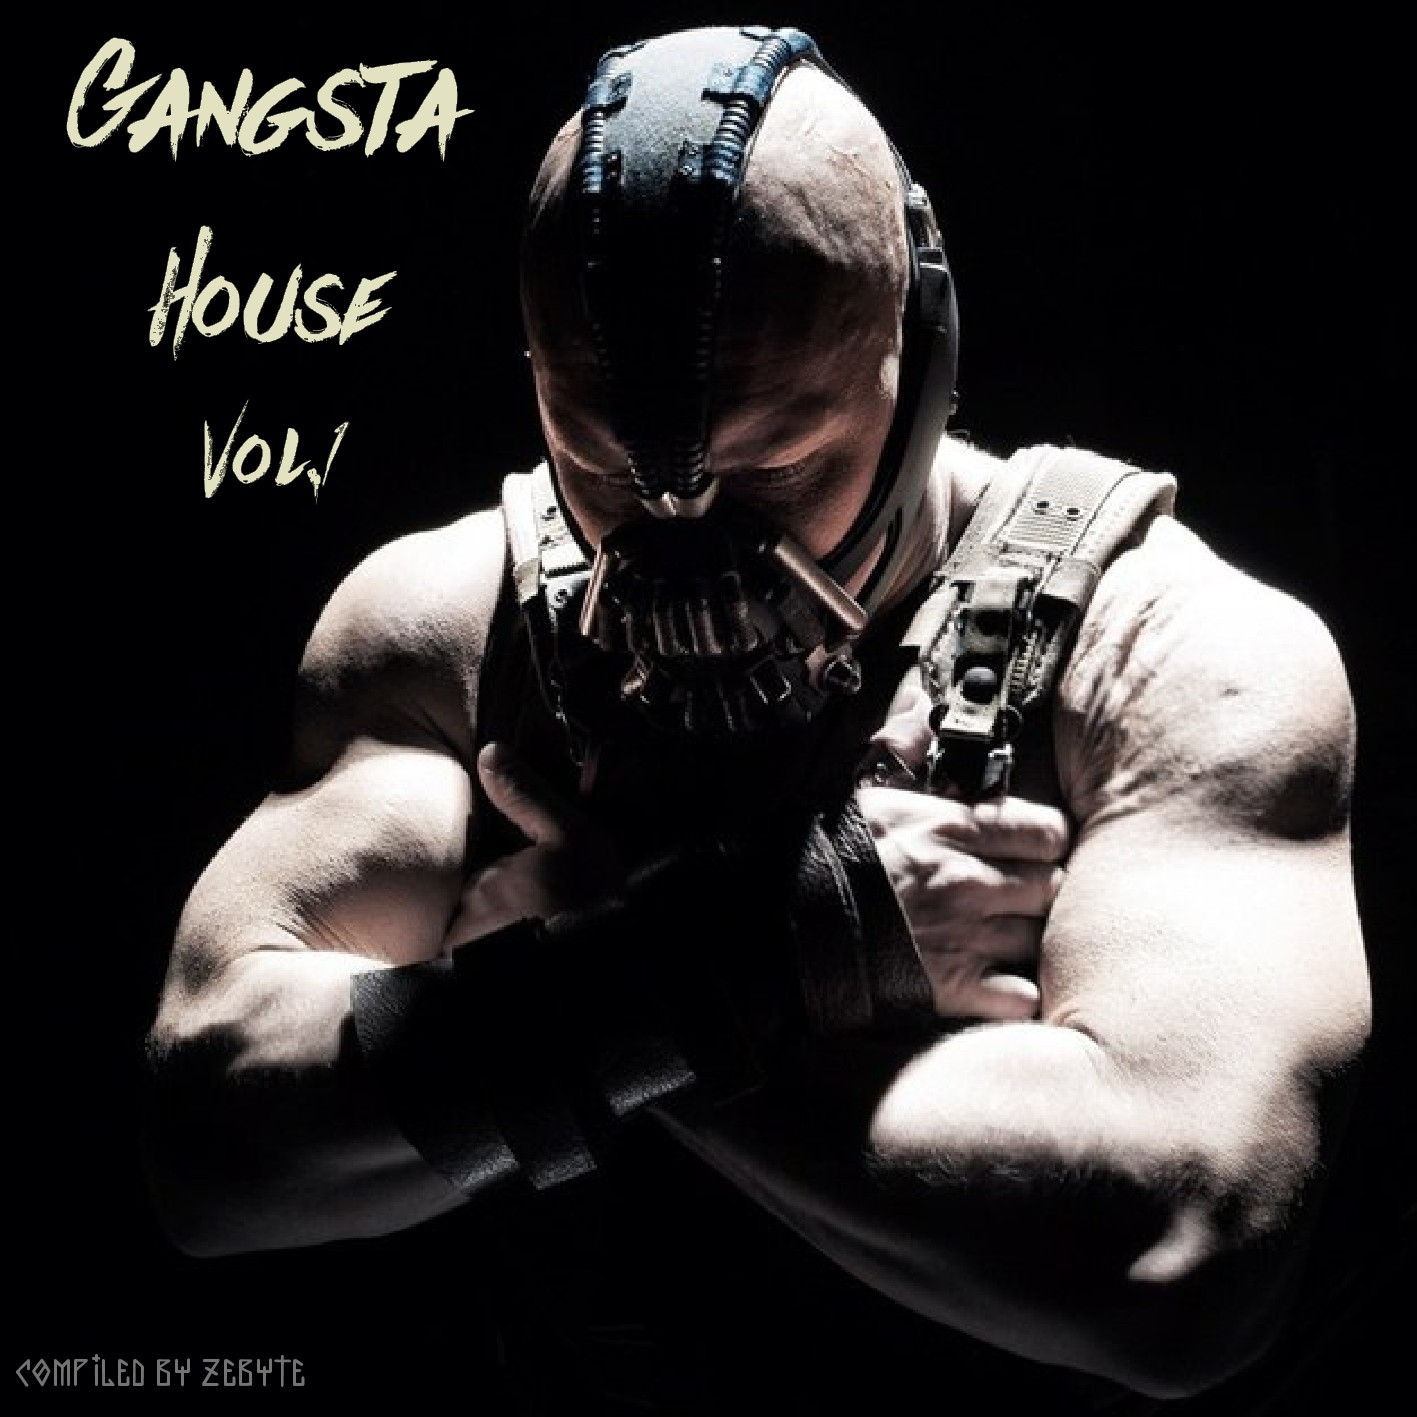 VA - Gangsta House Vol 1 [Compiled by Zebyte] (2016)